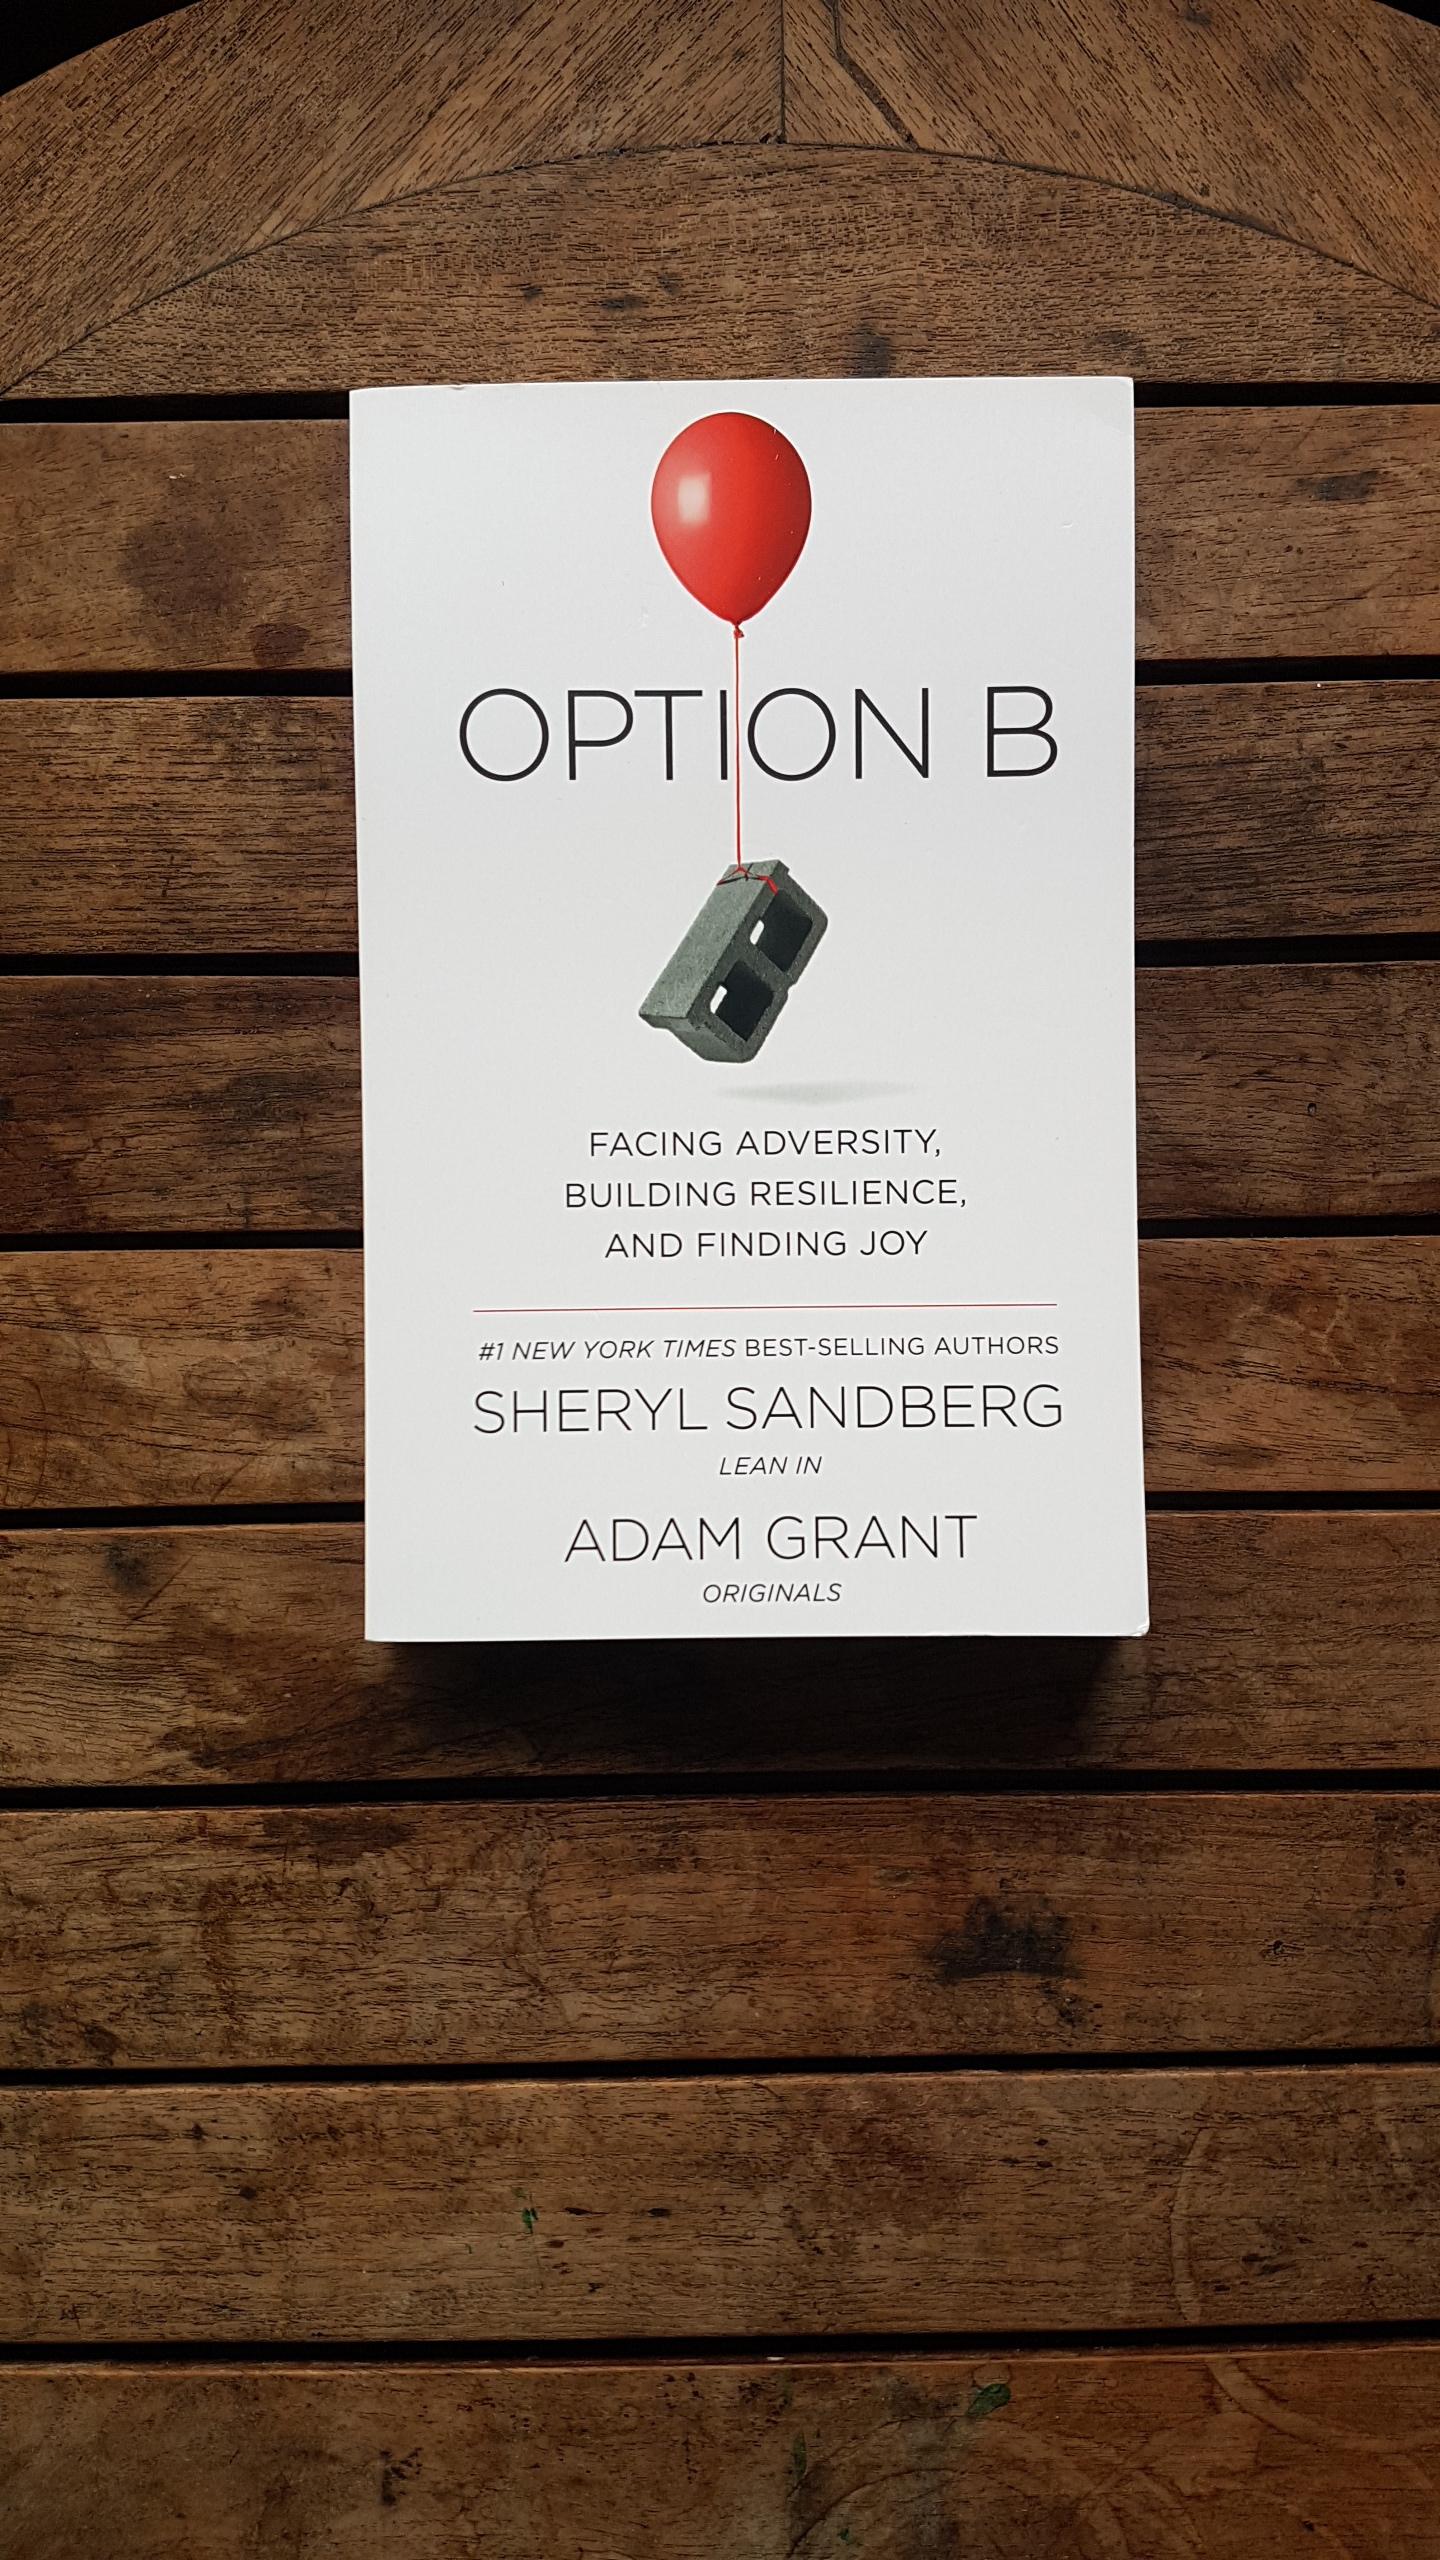 Option B: Facing Adversity, Building Resilience, and Finding Joy by Sheryl Sandberg